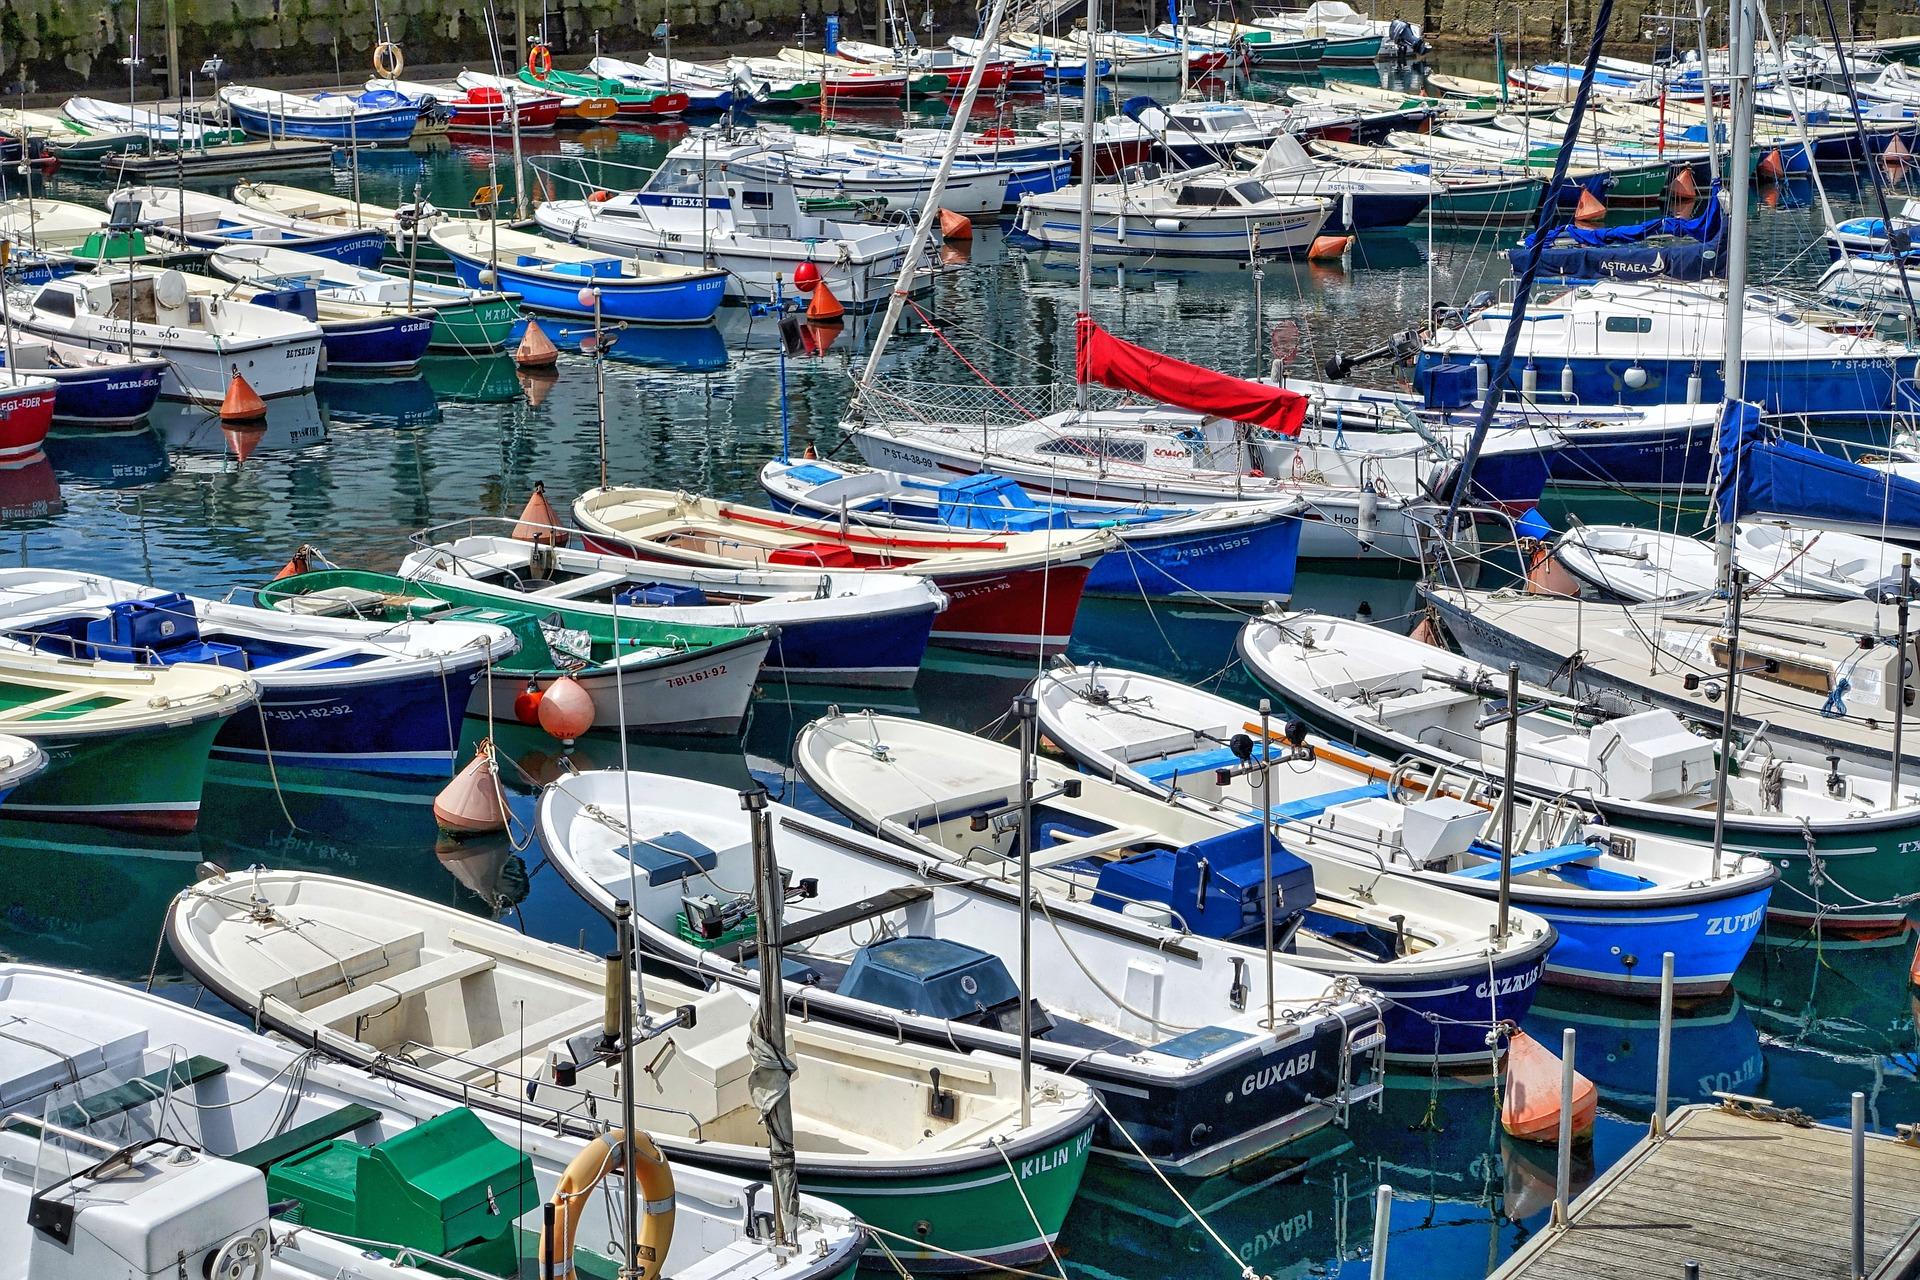 boats-1199112_1920.jpg